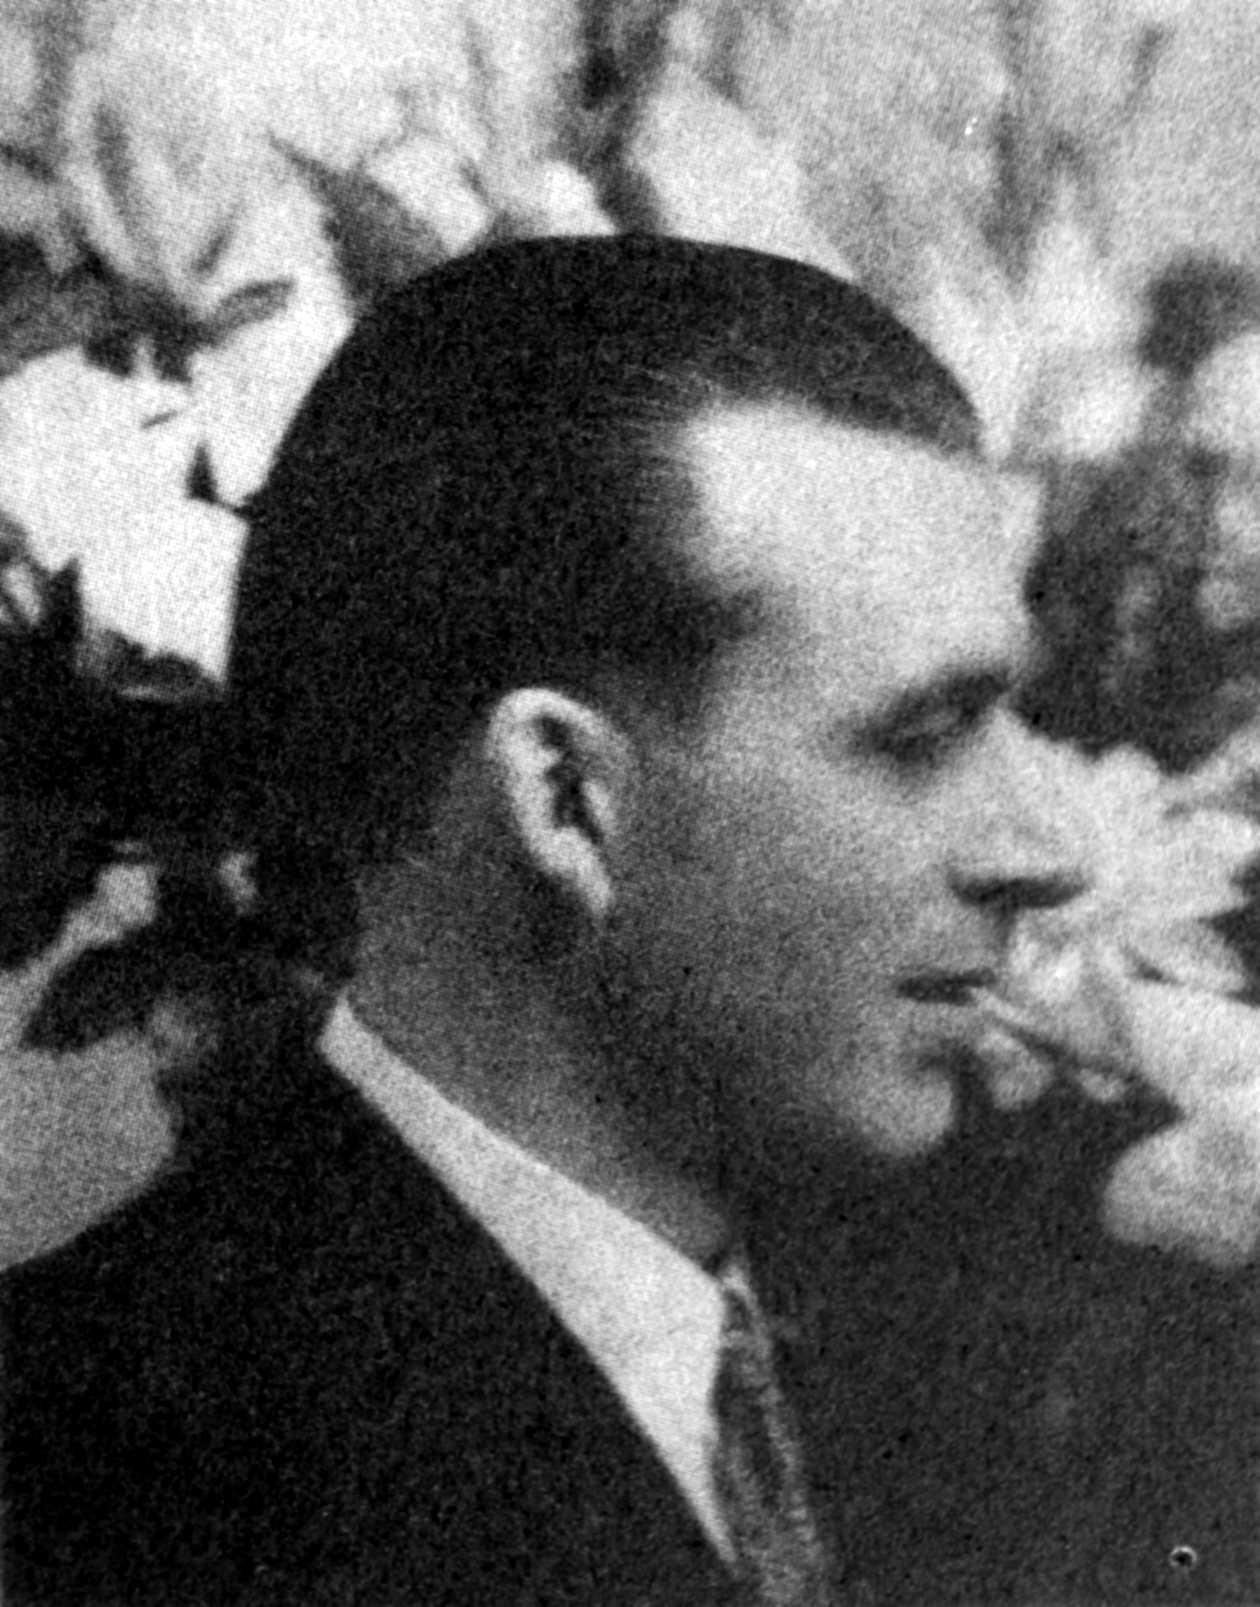 El guerrillero cervantino Abelardo Gutiérrez Alba.